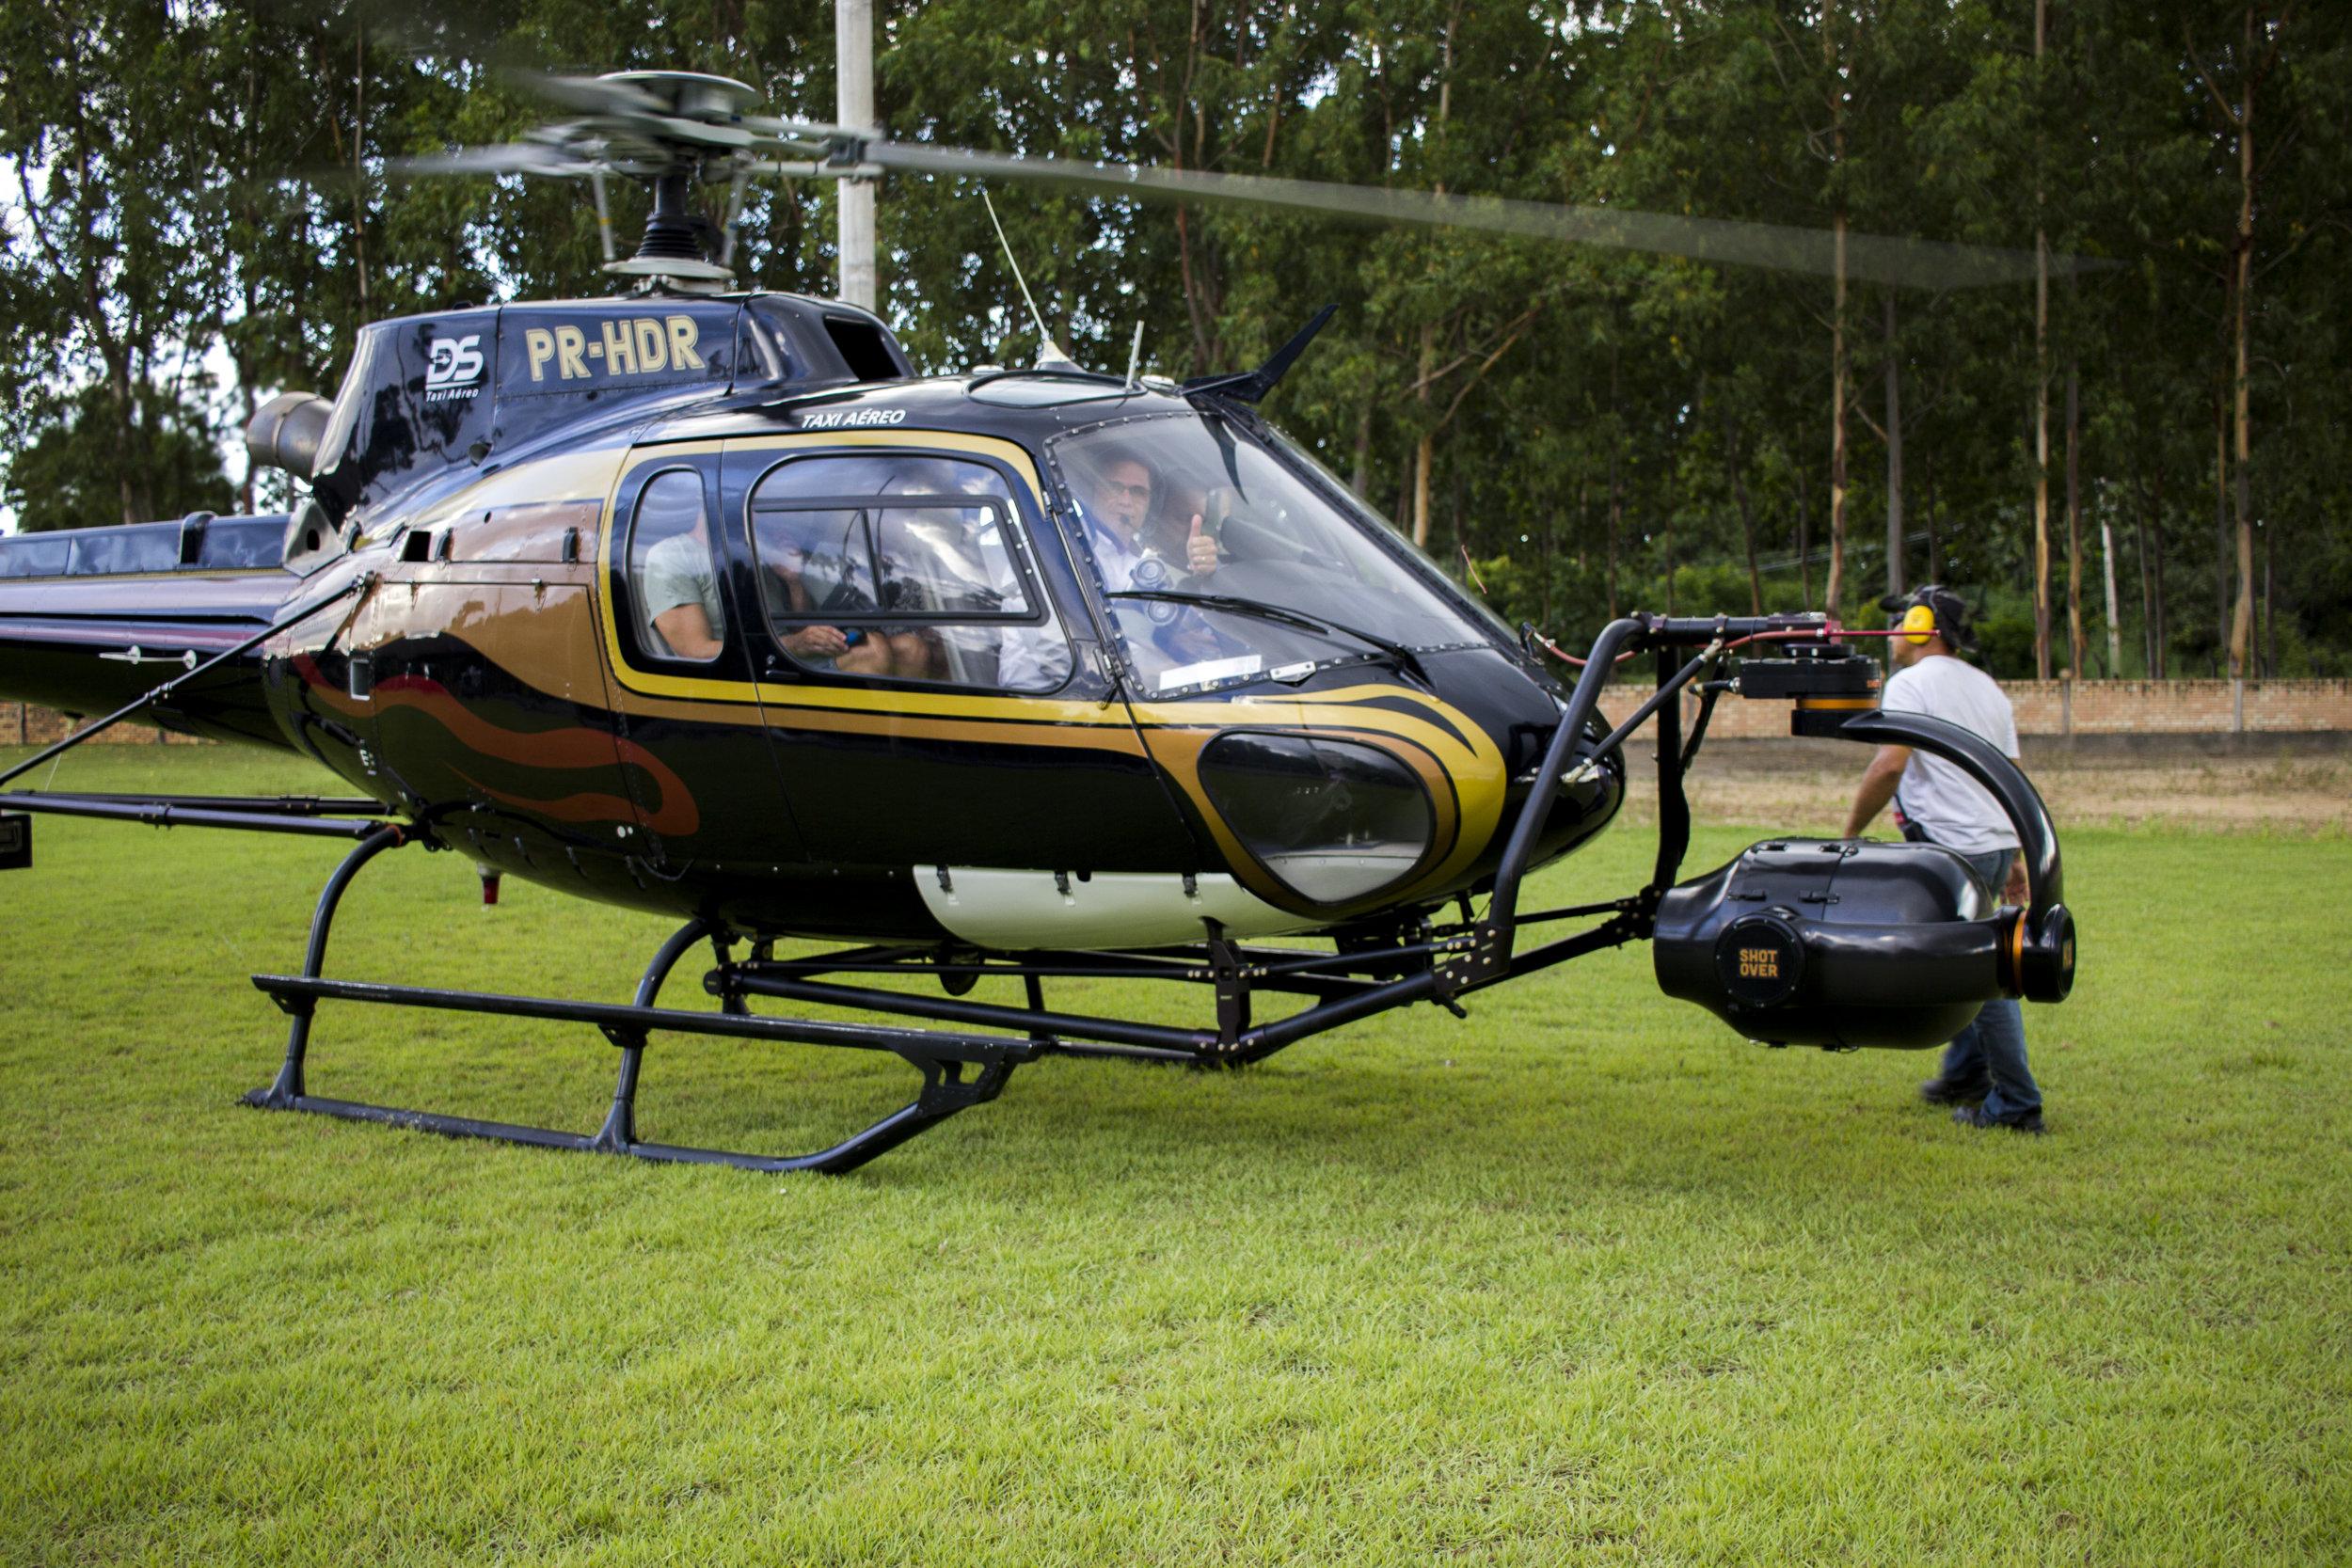 Helicóptero especial utilizado na filmagem.